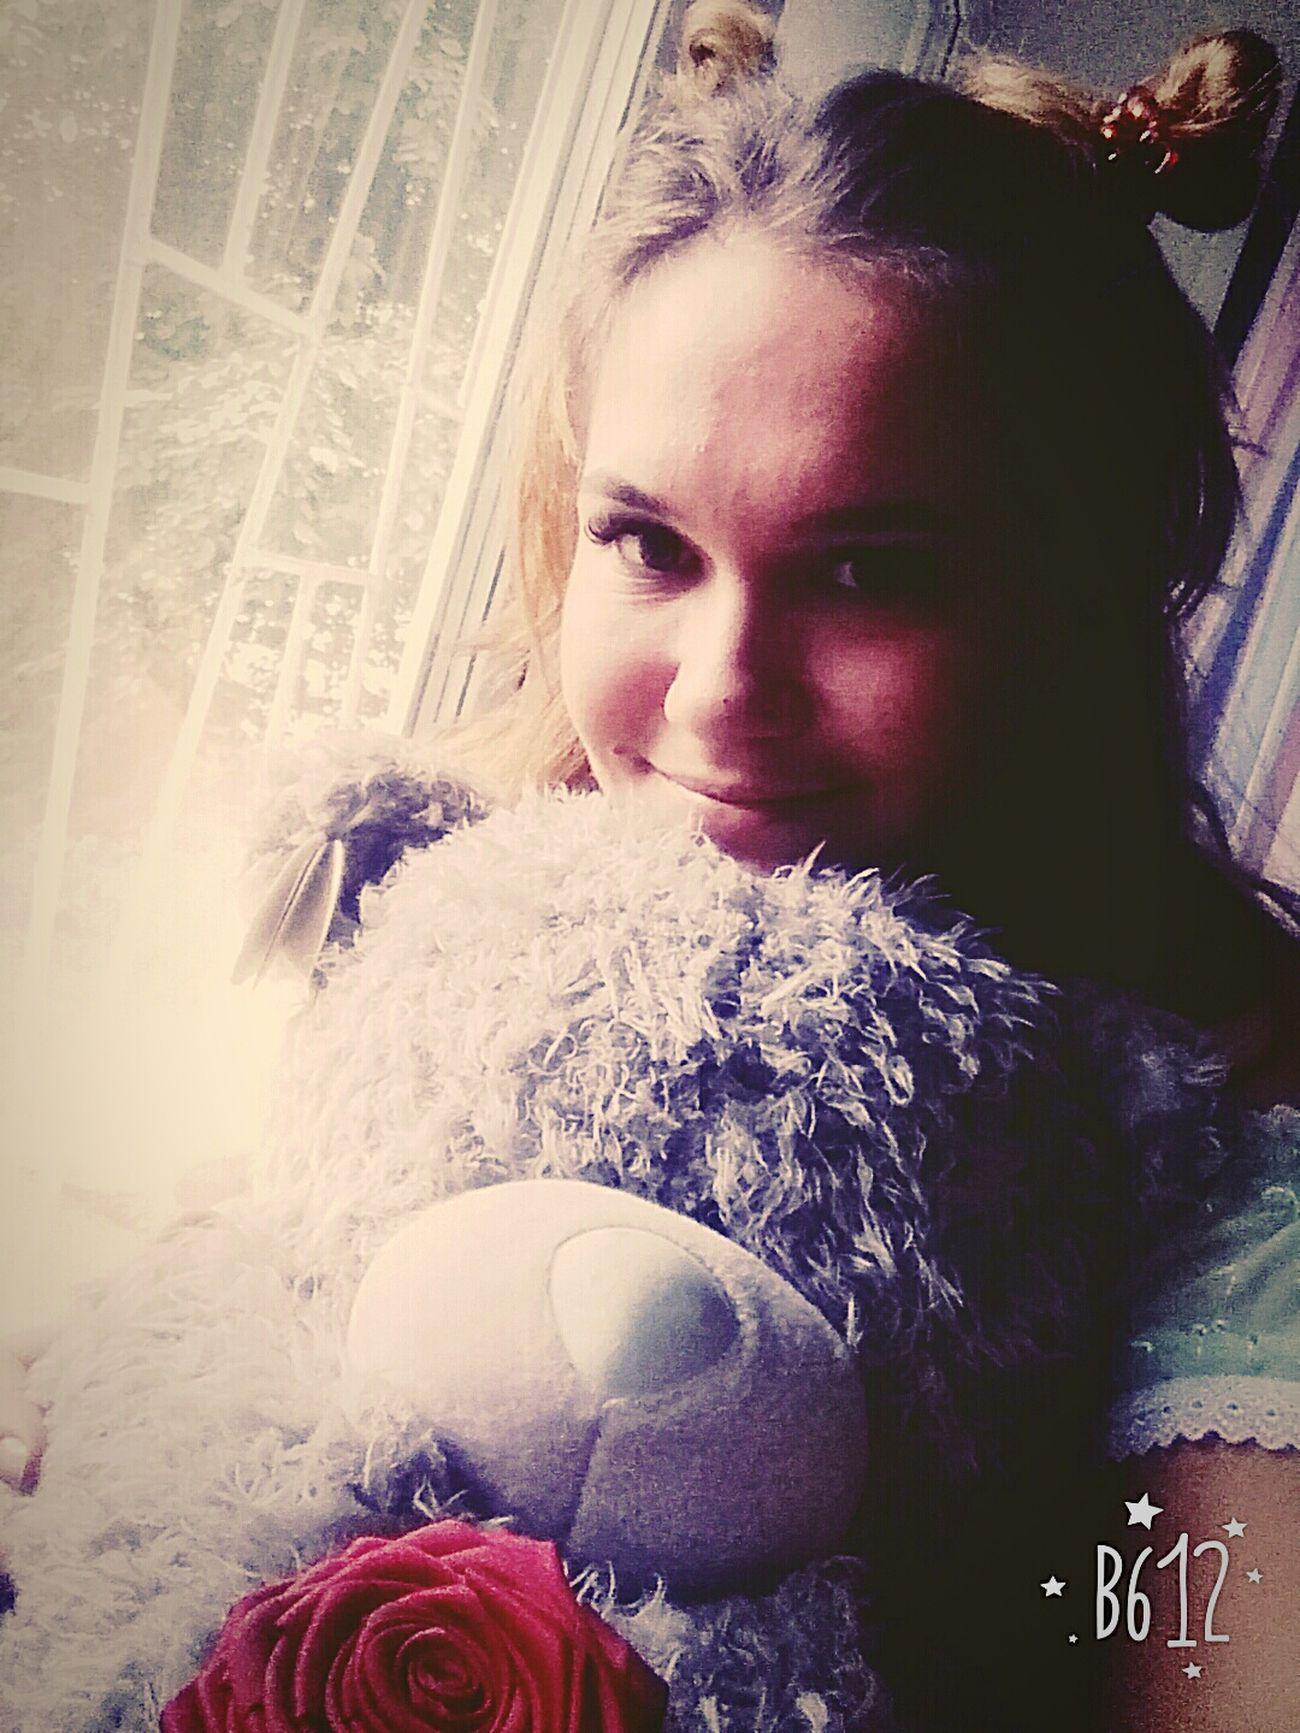 Teddylove That's Me Selfie ✌